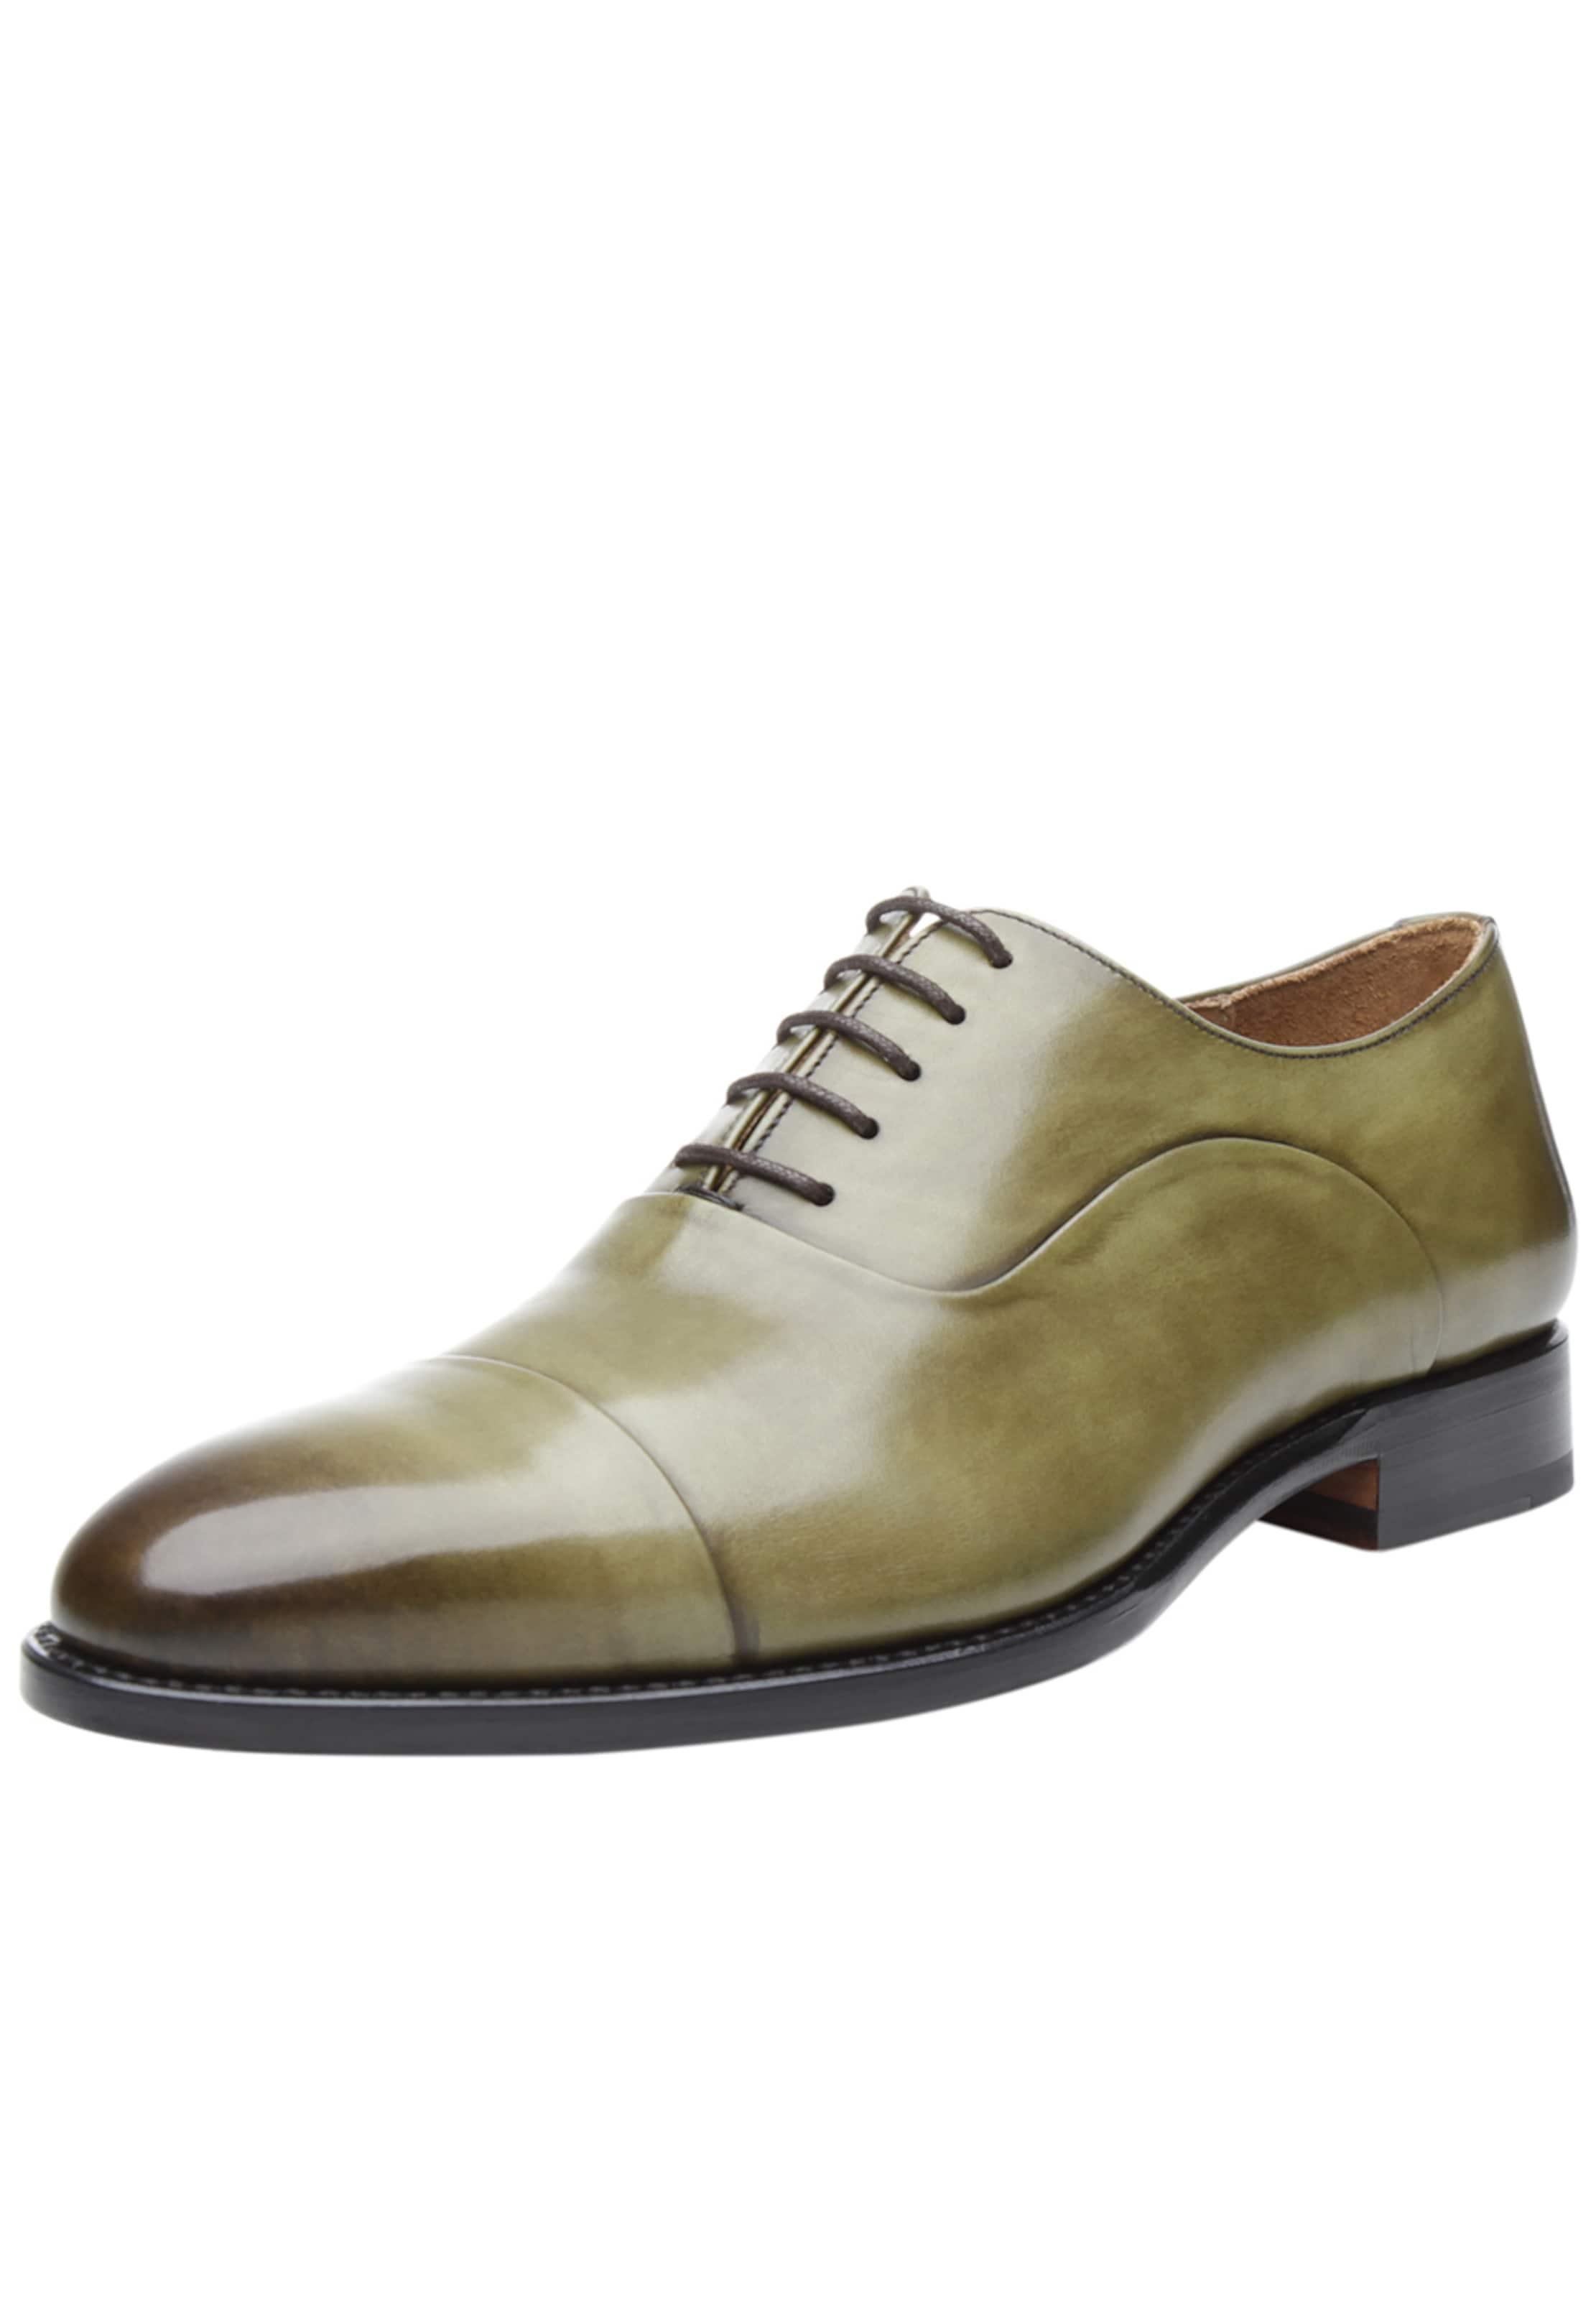 Shoepassion Shoepassion Halbschuhe In Oliv 'no5229' Aj4L35R